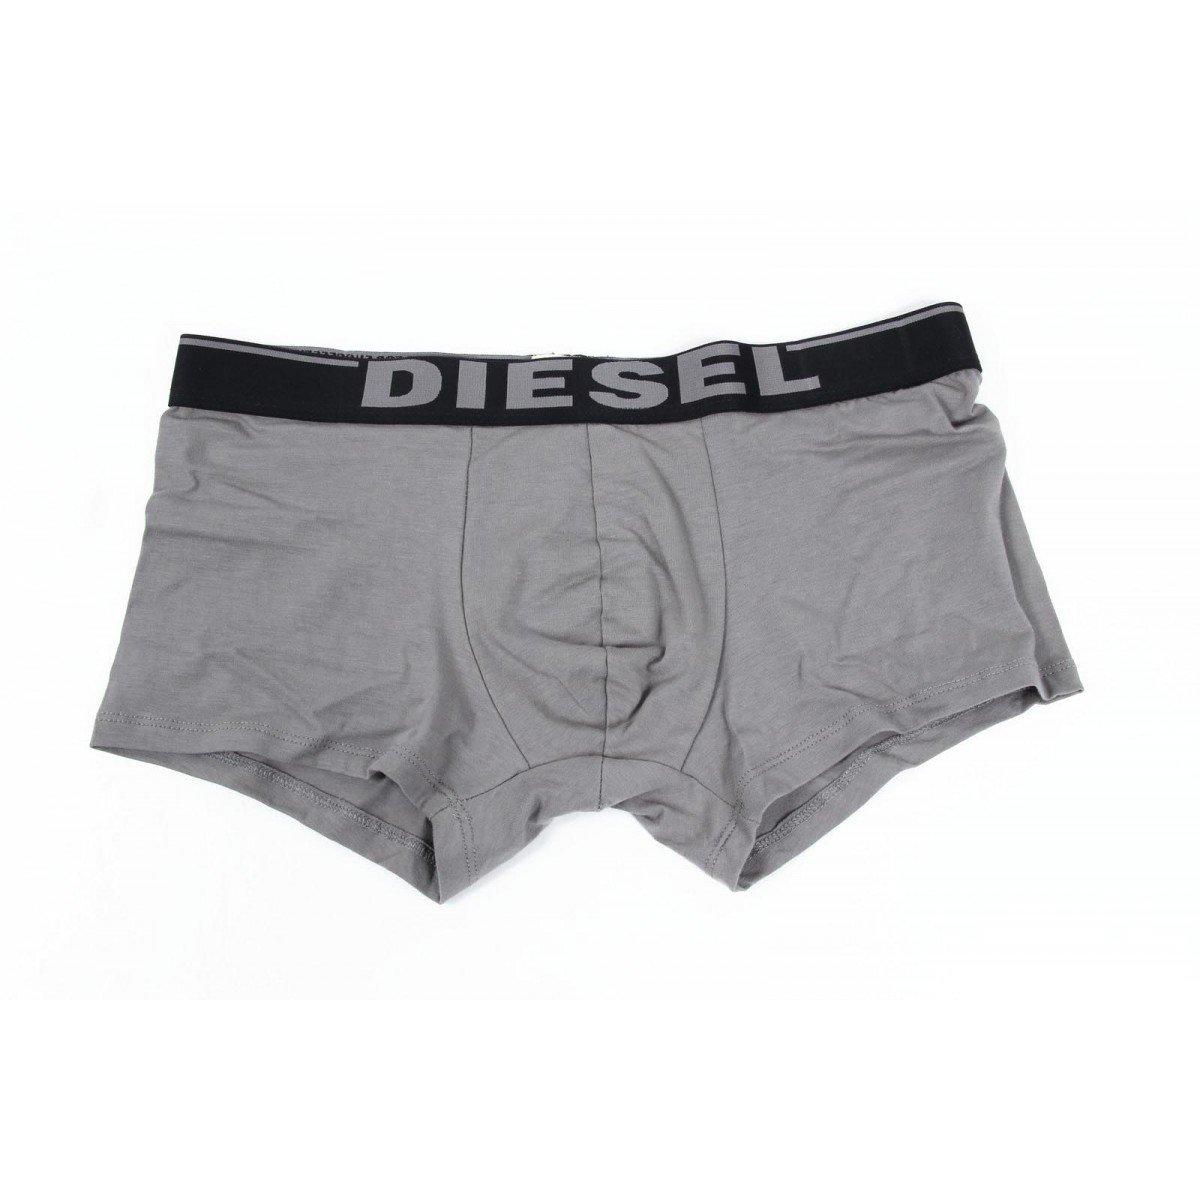 611uJPiHsIL - Diesel Rocco Bóxer para Hombre